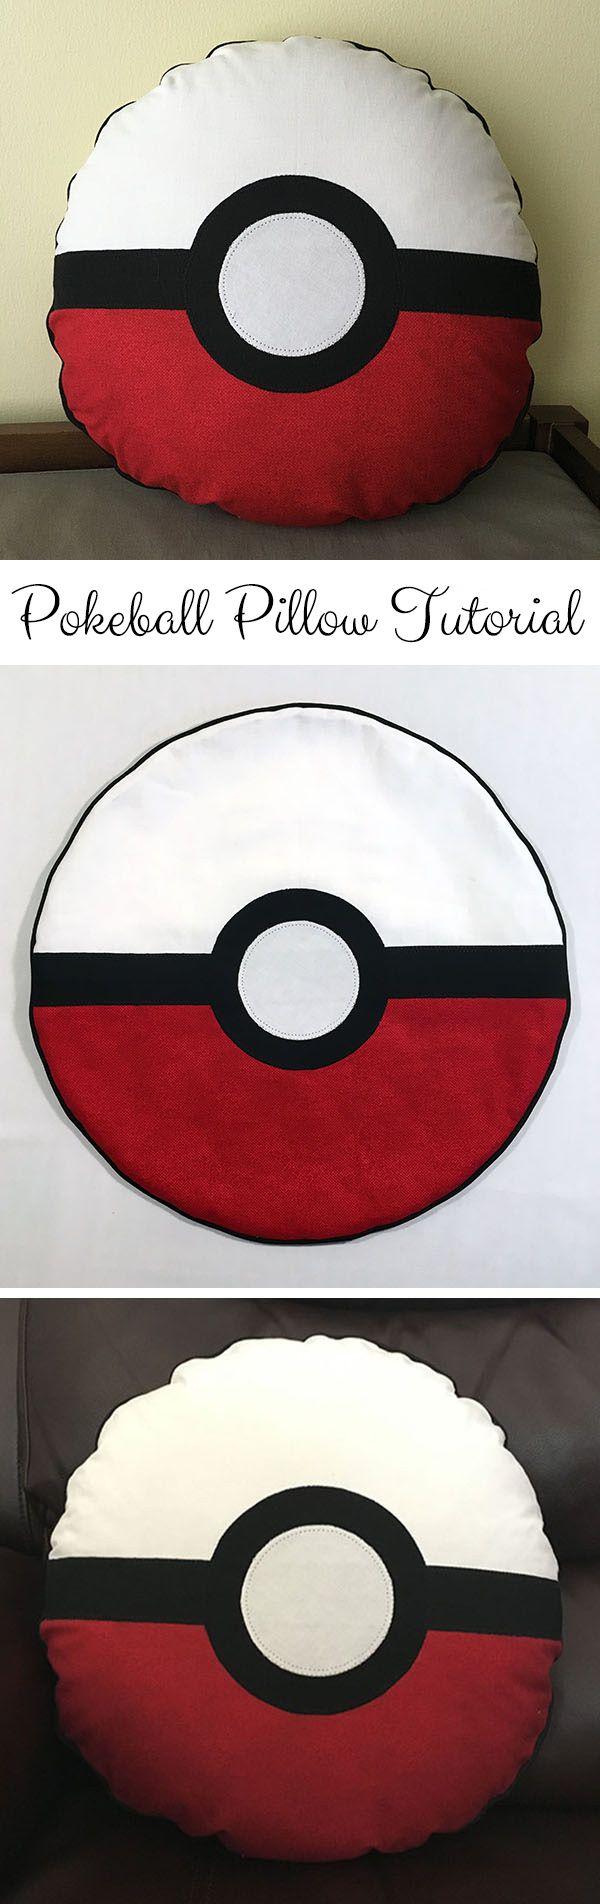 Pokemon Pokeball Pillow Tutorial | Sewing Tutorial | #InspirationSpotlight